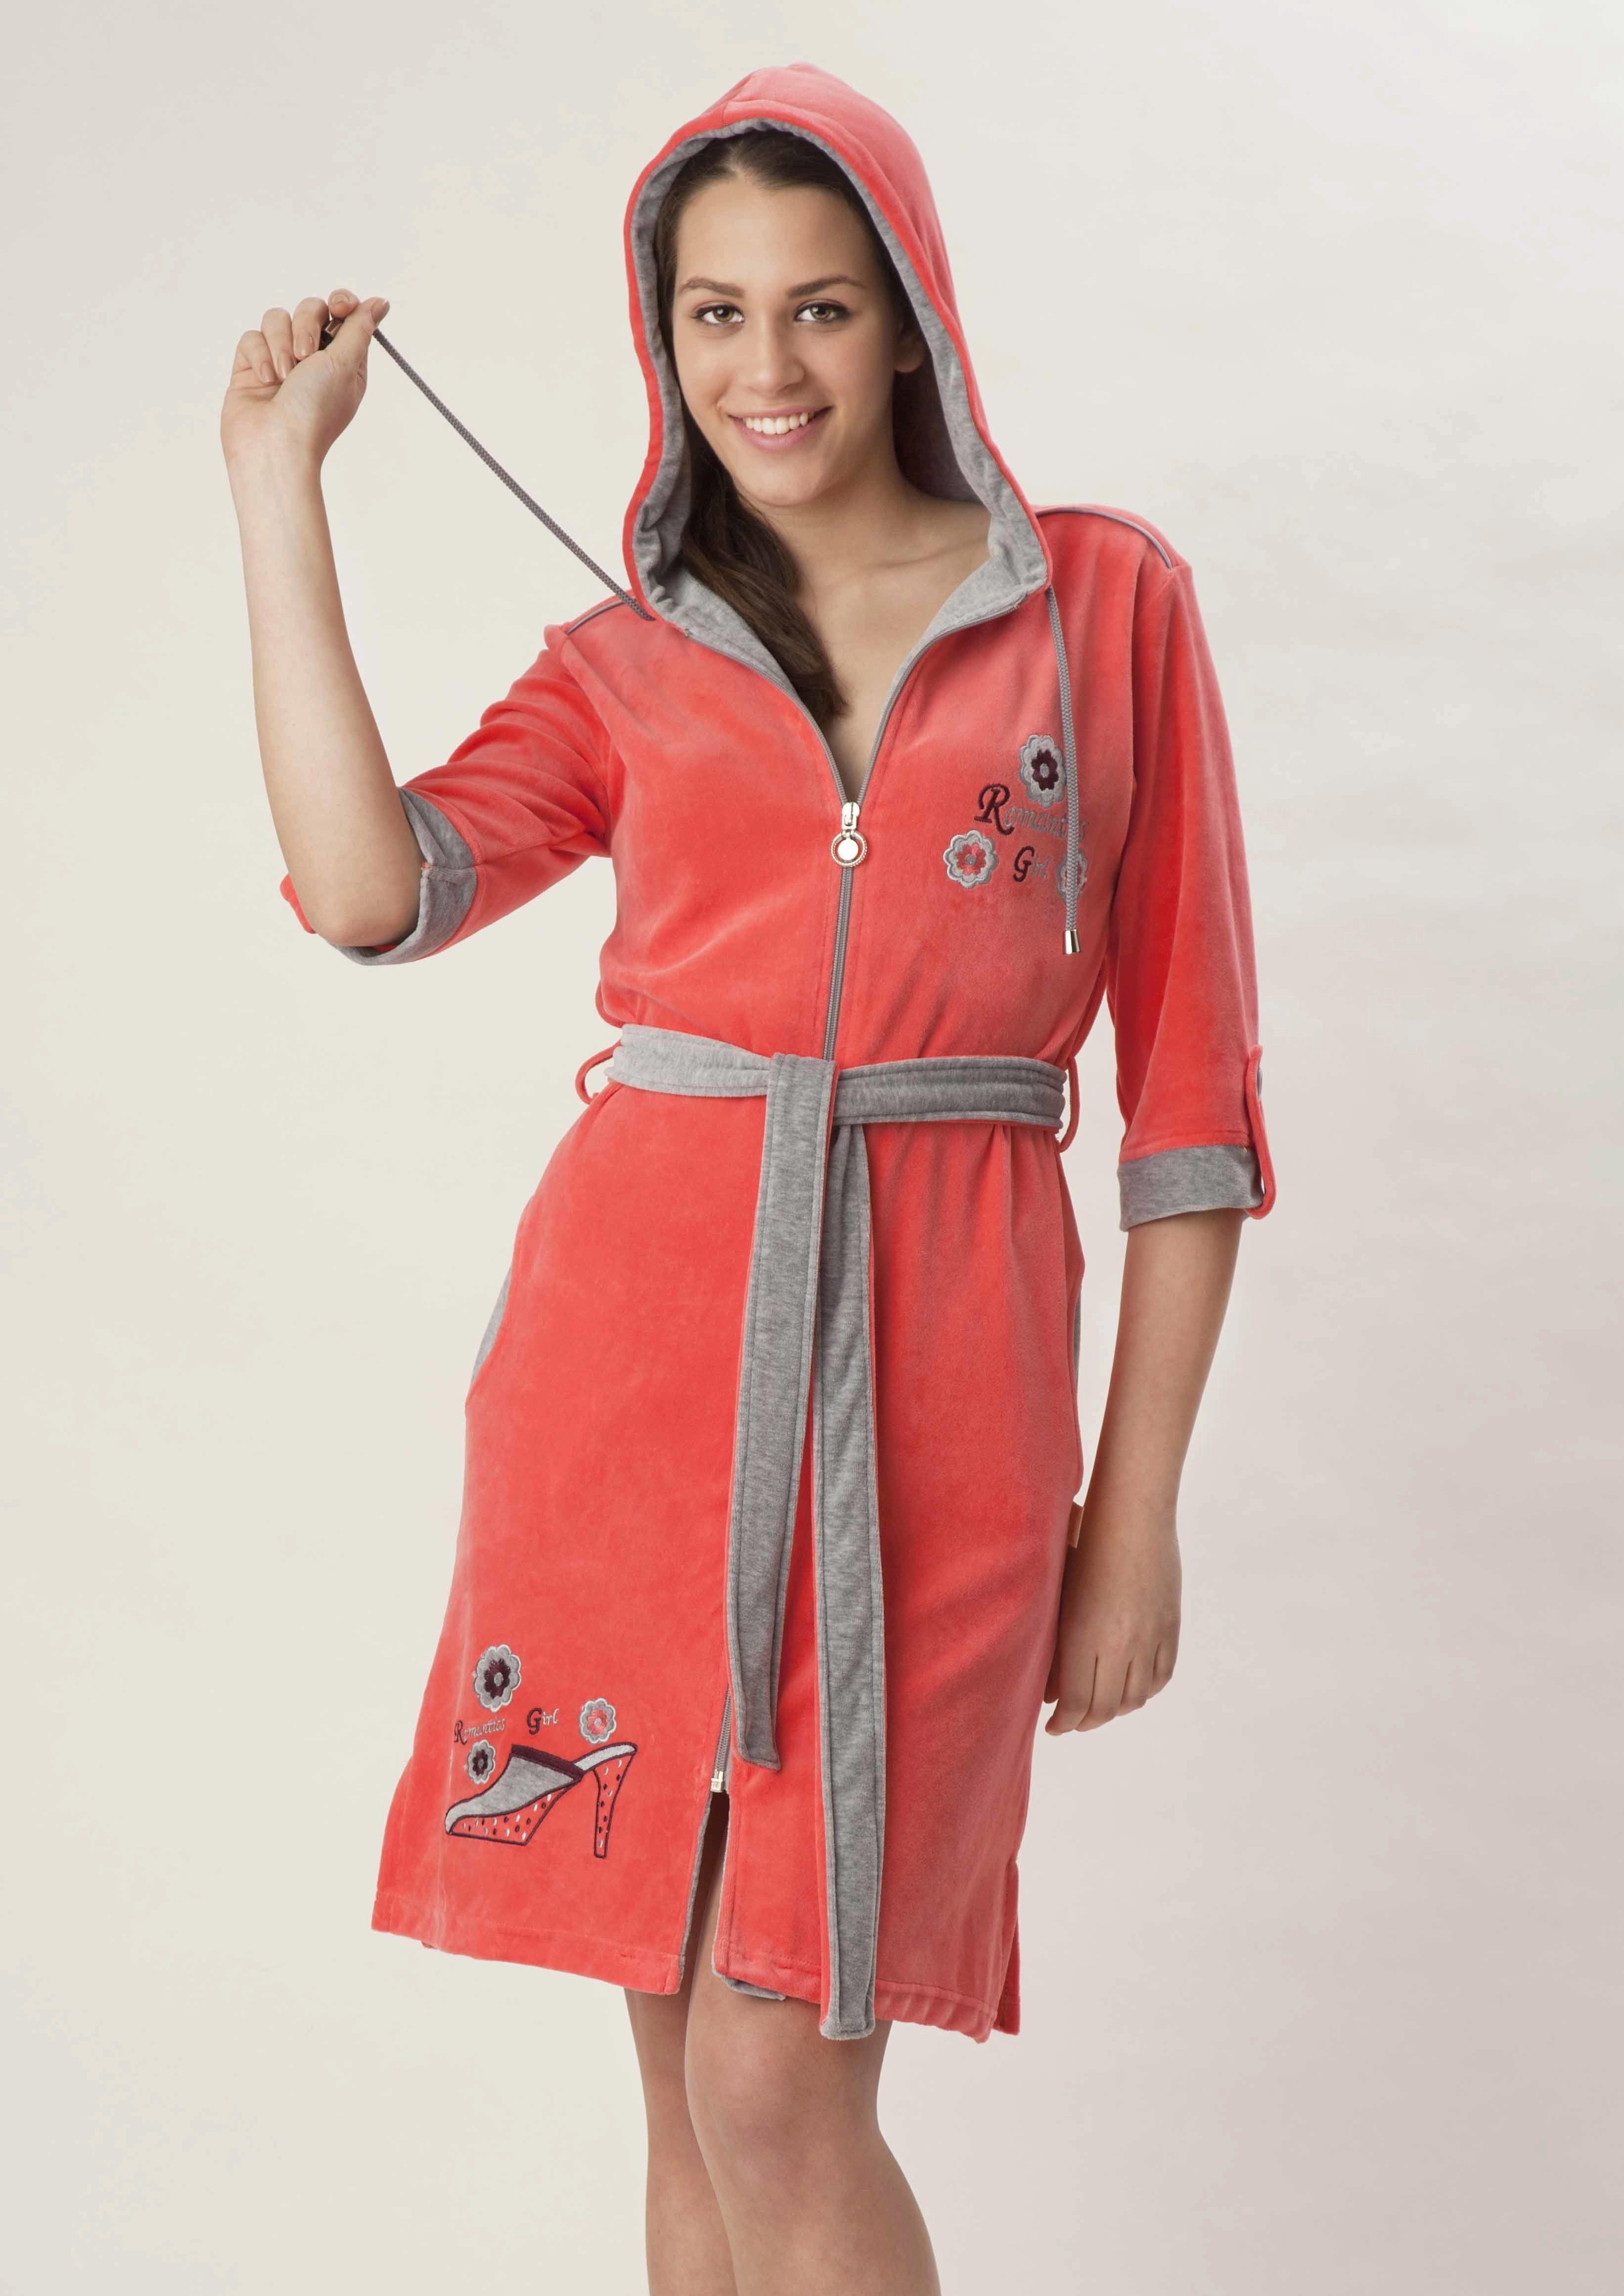 Турецкие костюмы женские